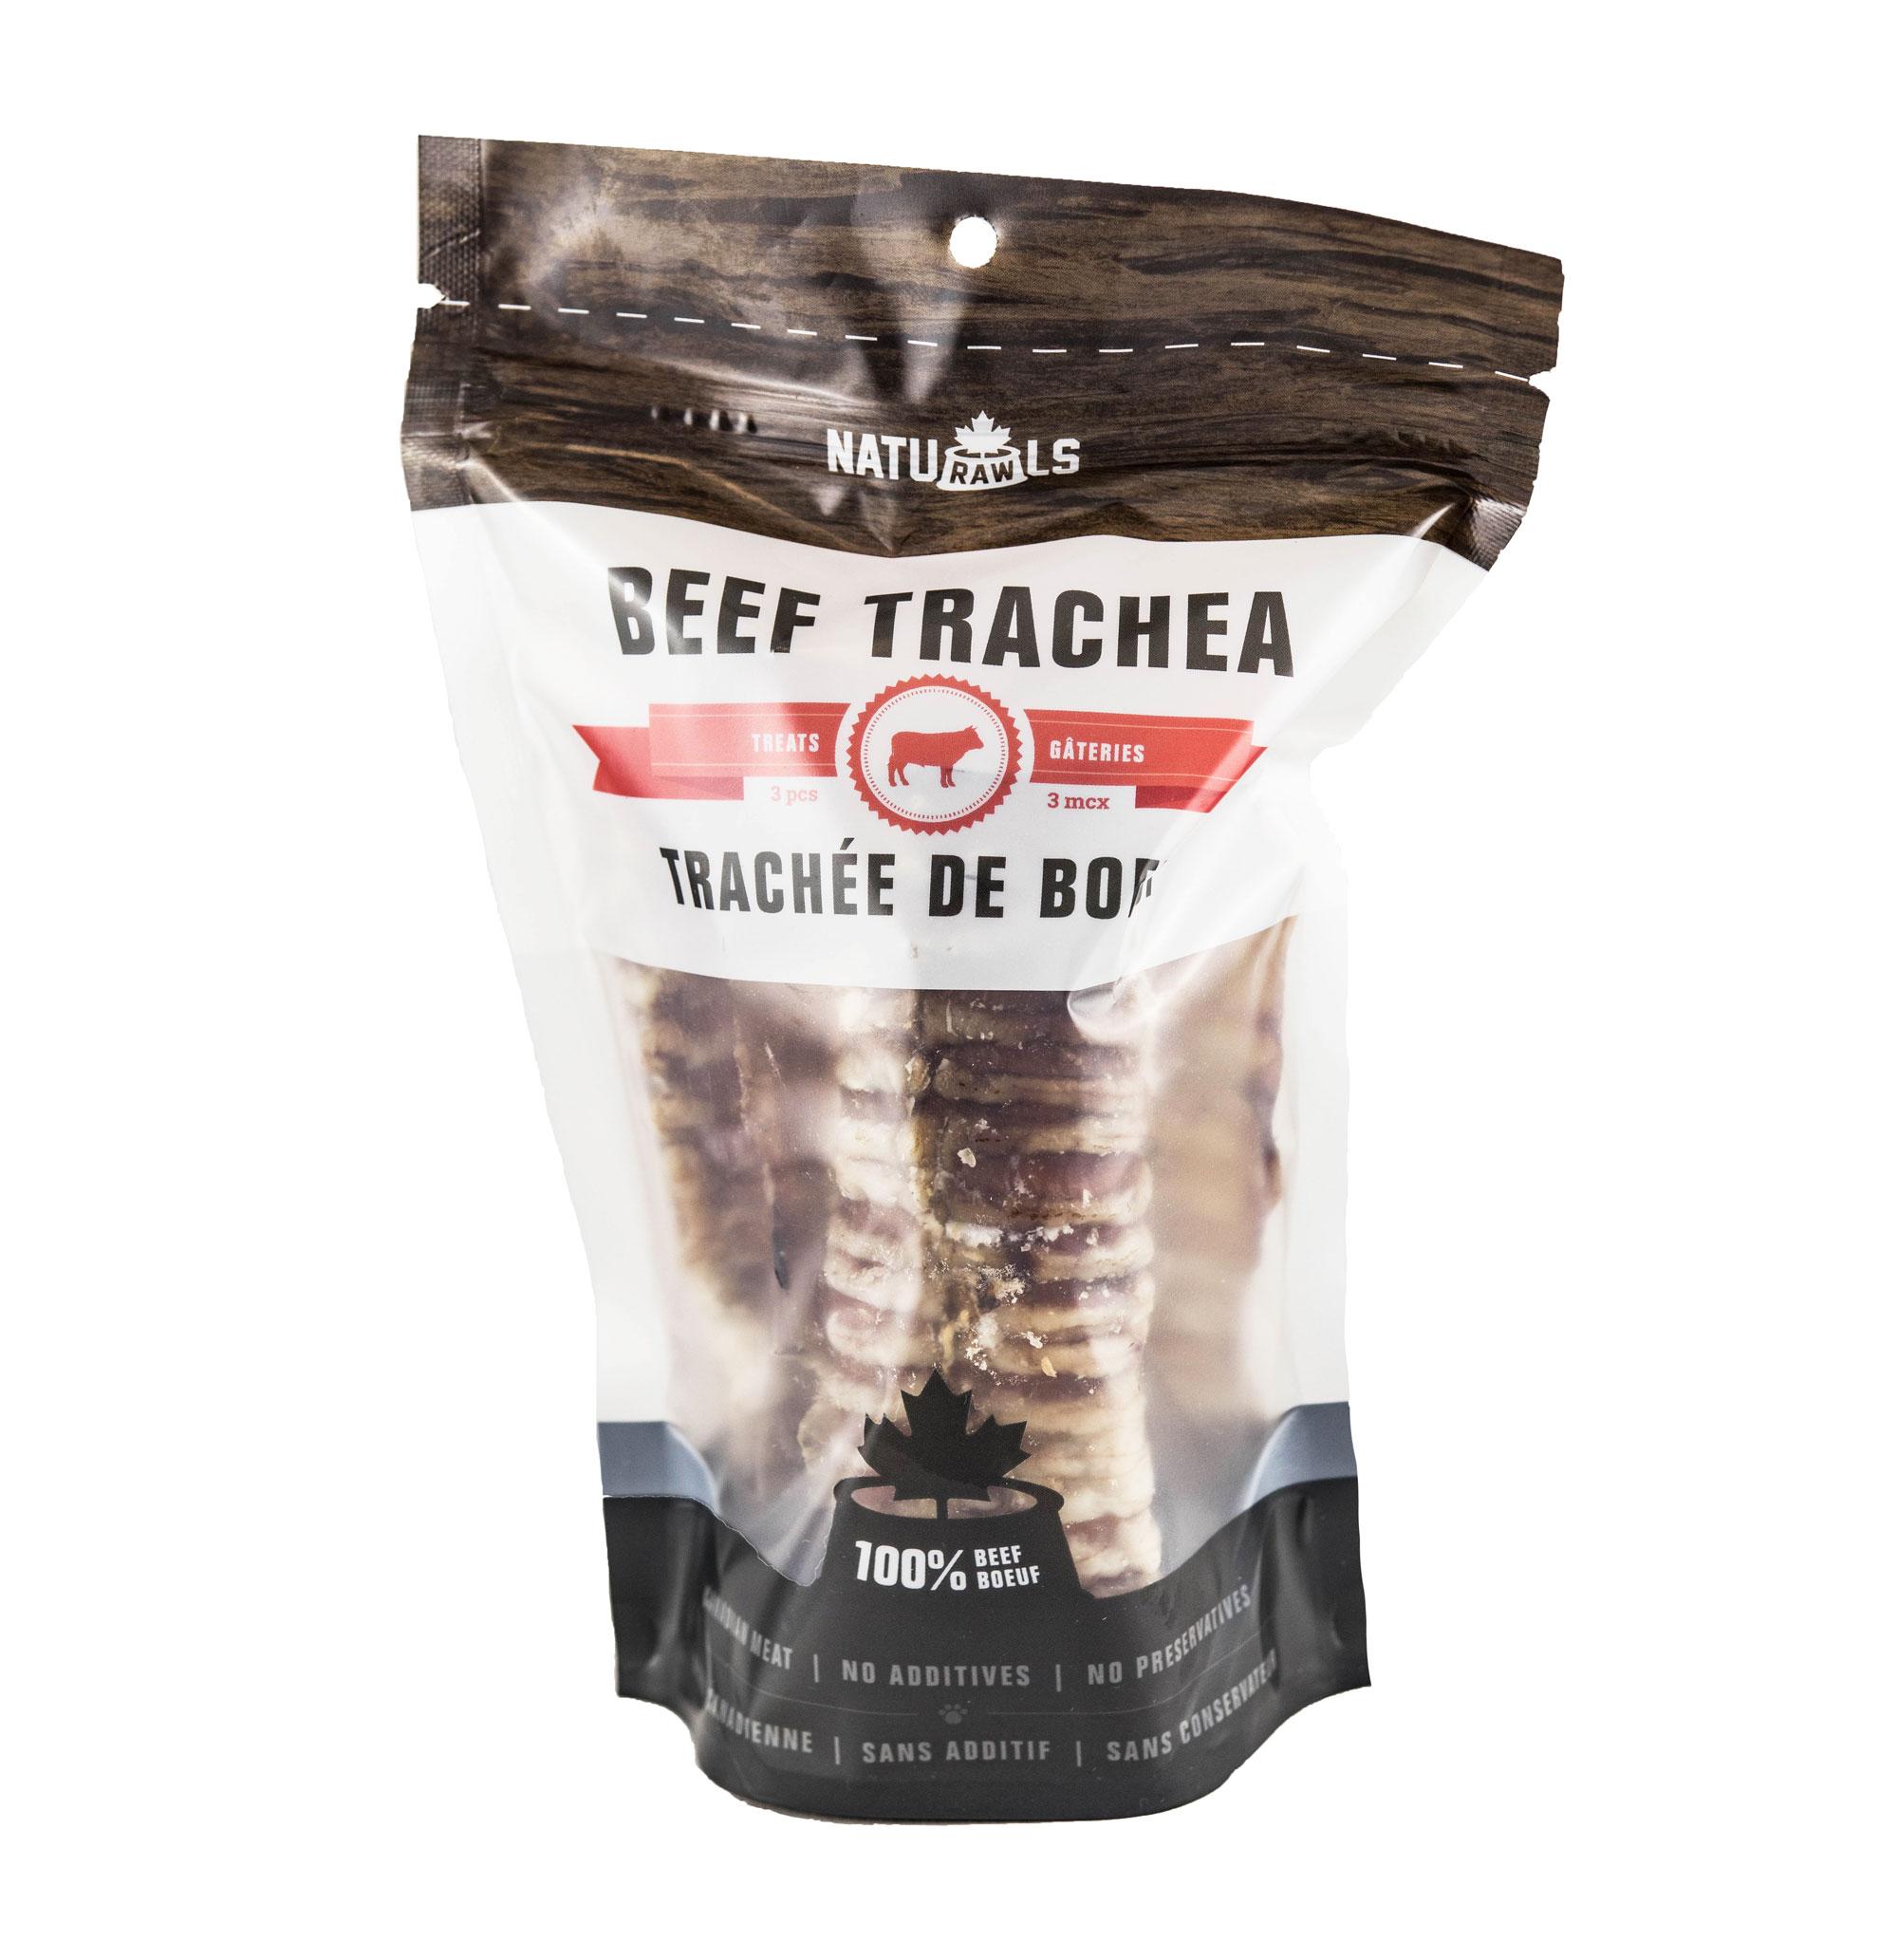 Naturawls Beef Trachea Dehydrated Dog Treats, 3-piece